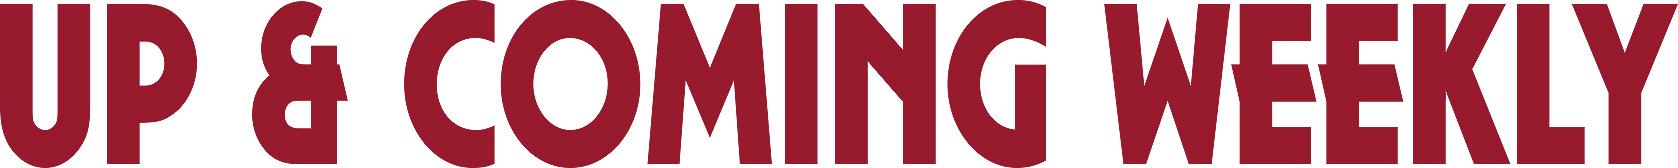 U&C rusty logo!.jpg